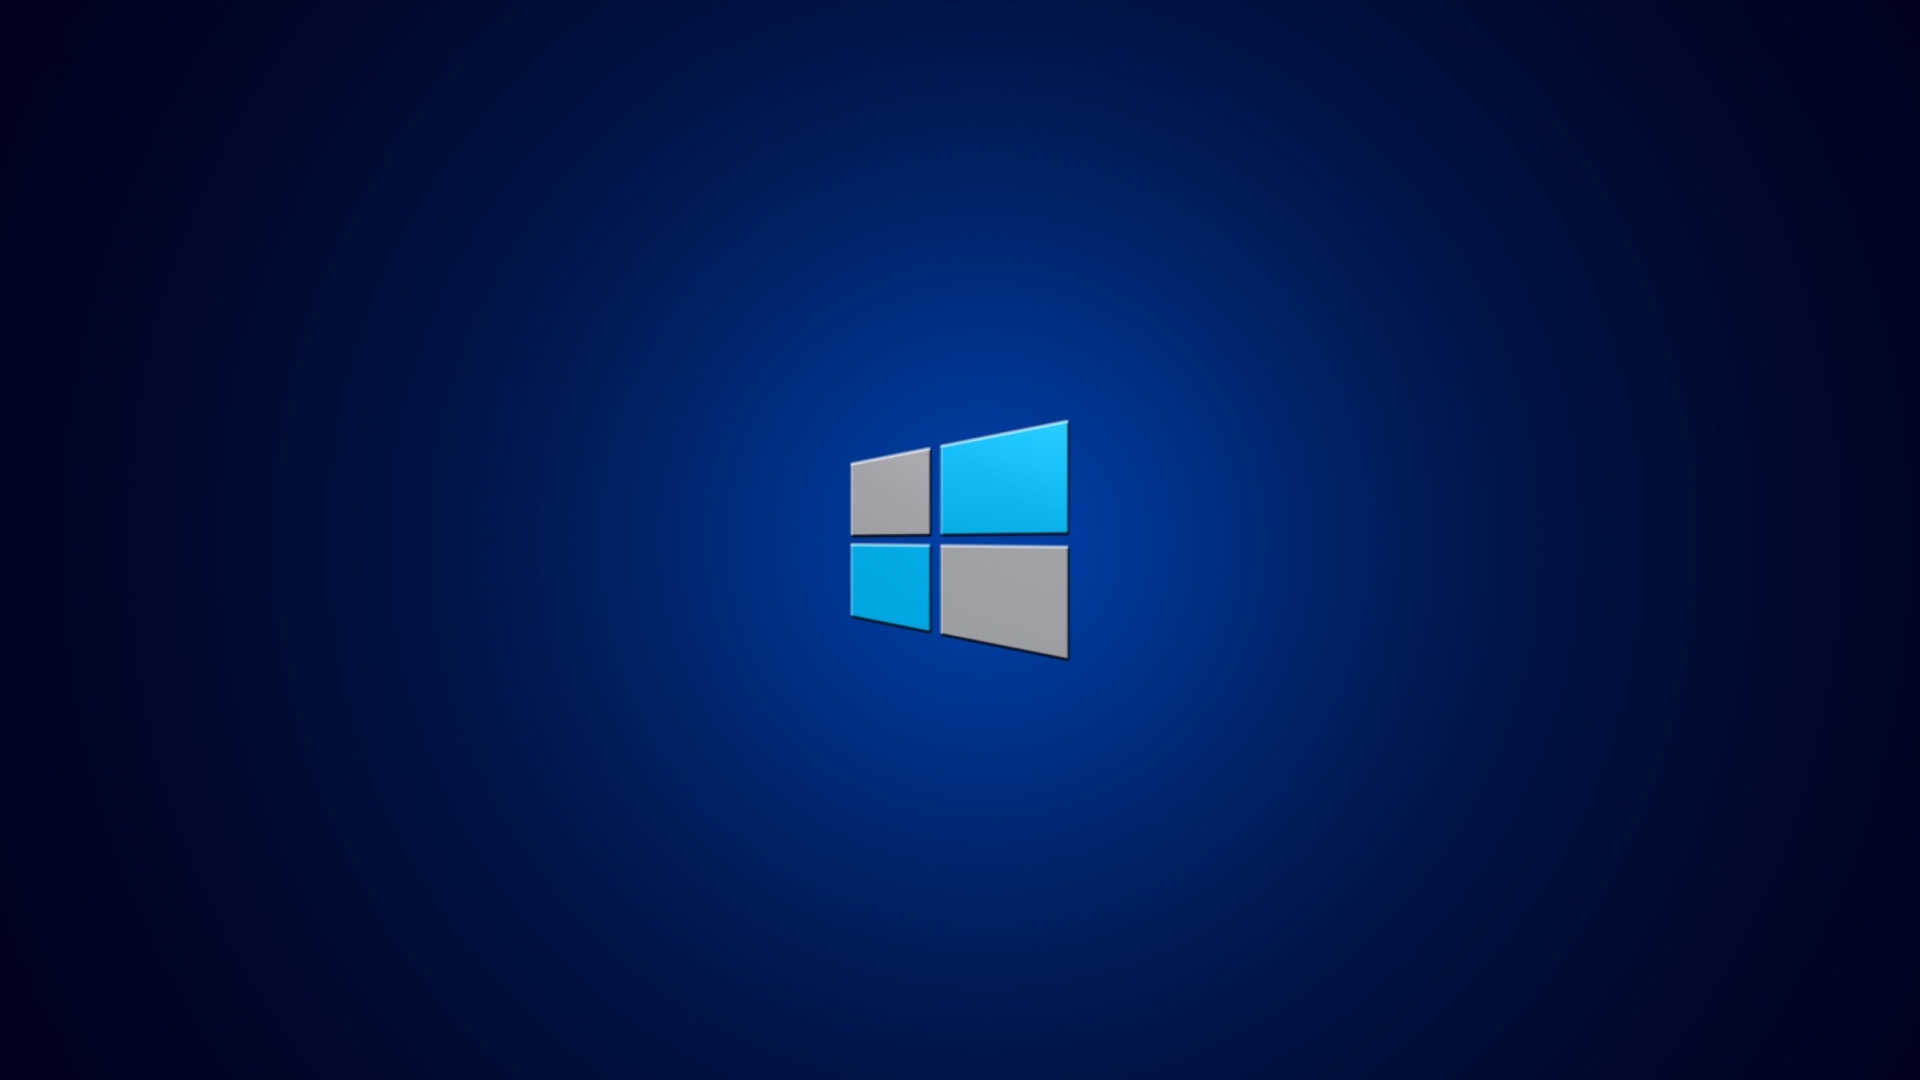 Windows 8 Background Free Download